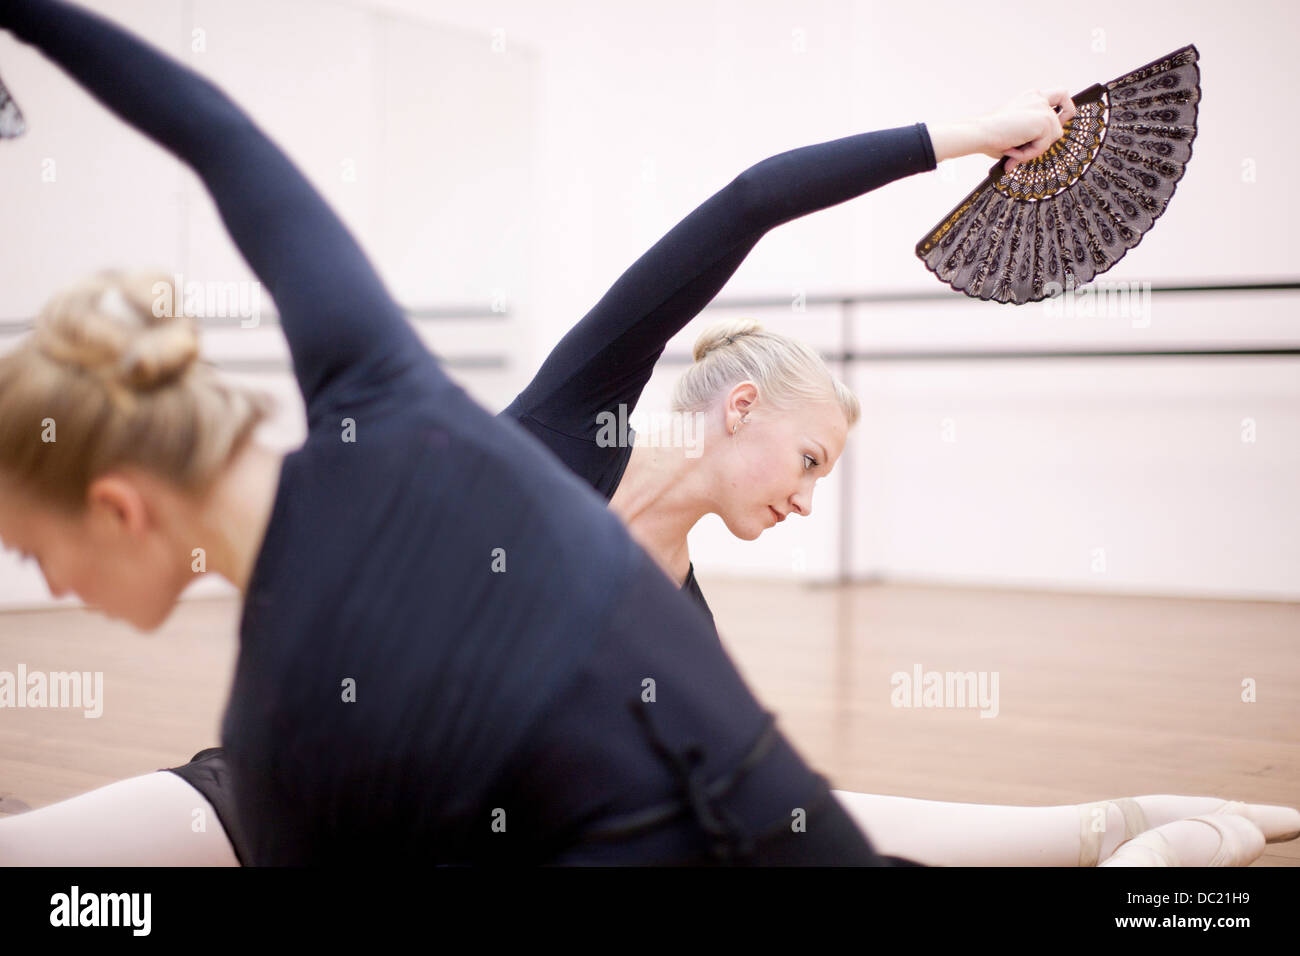 Ballerinas in symmetrical floor pose - Stock Image